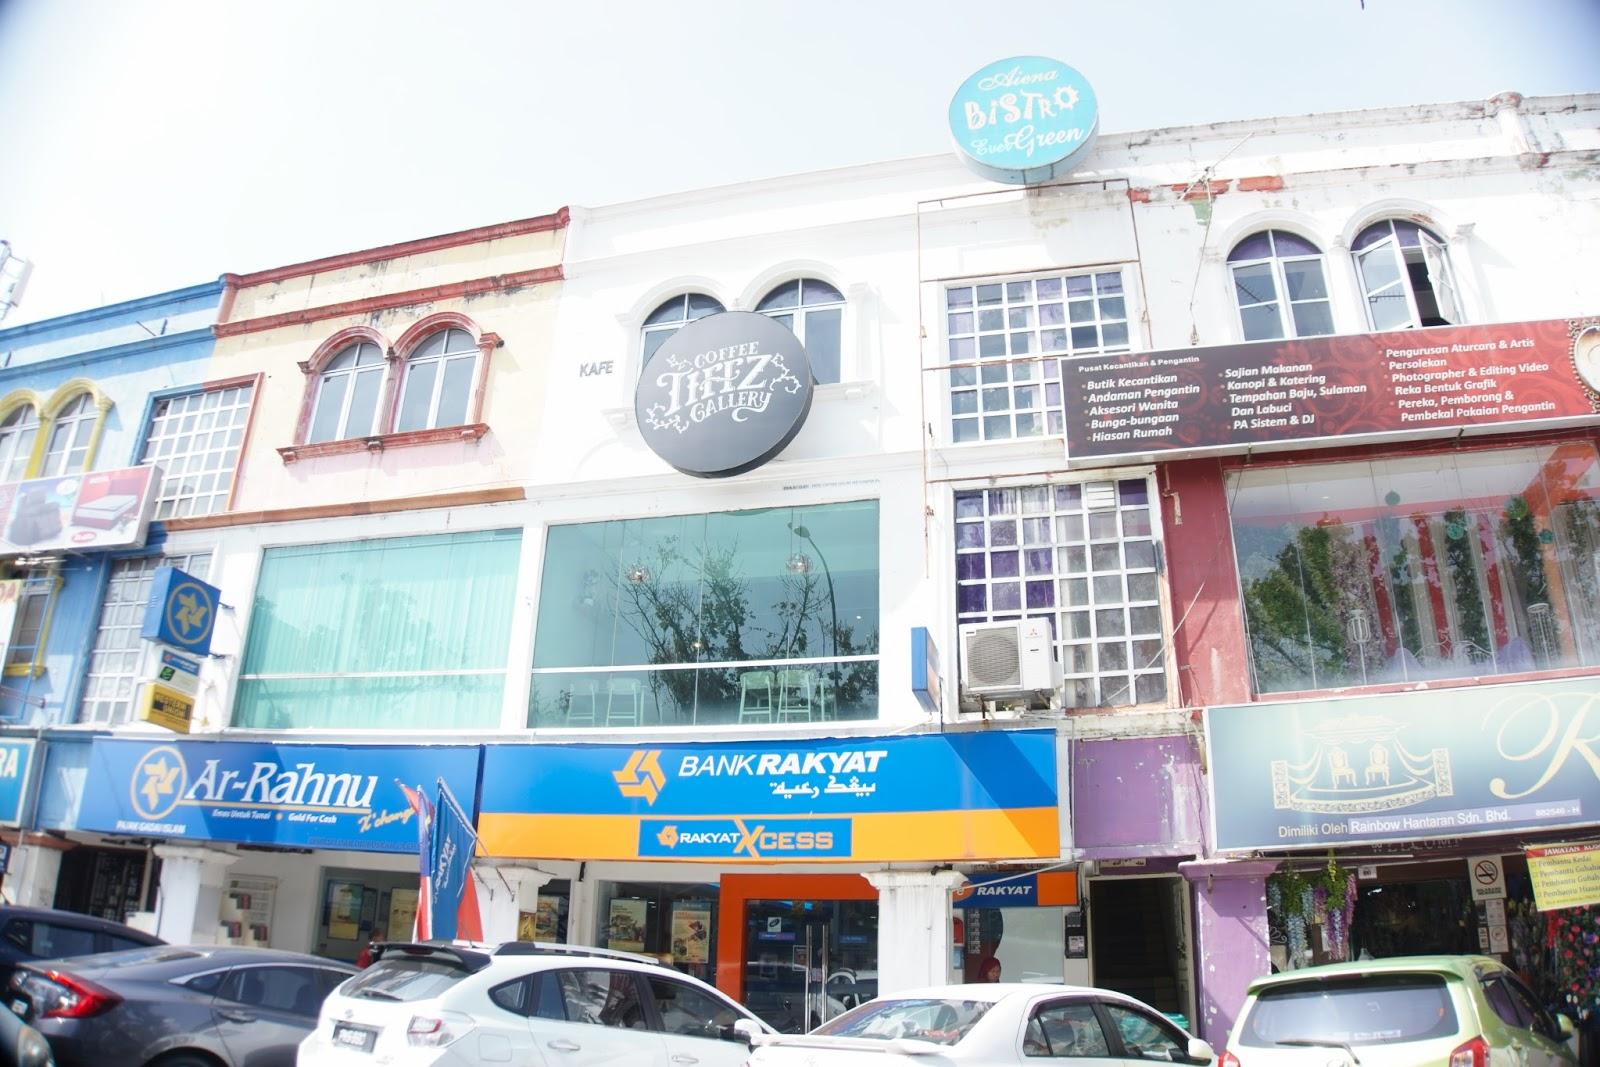 Tiffz Coffee Gallery Cafe Alor Setar, Kedah